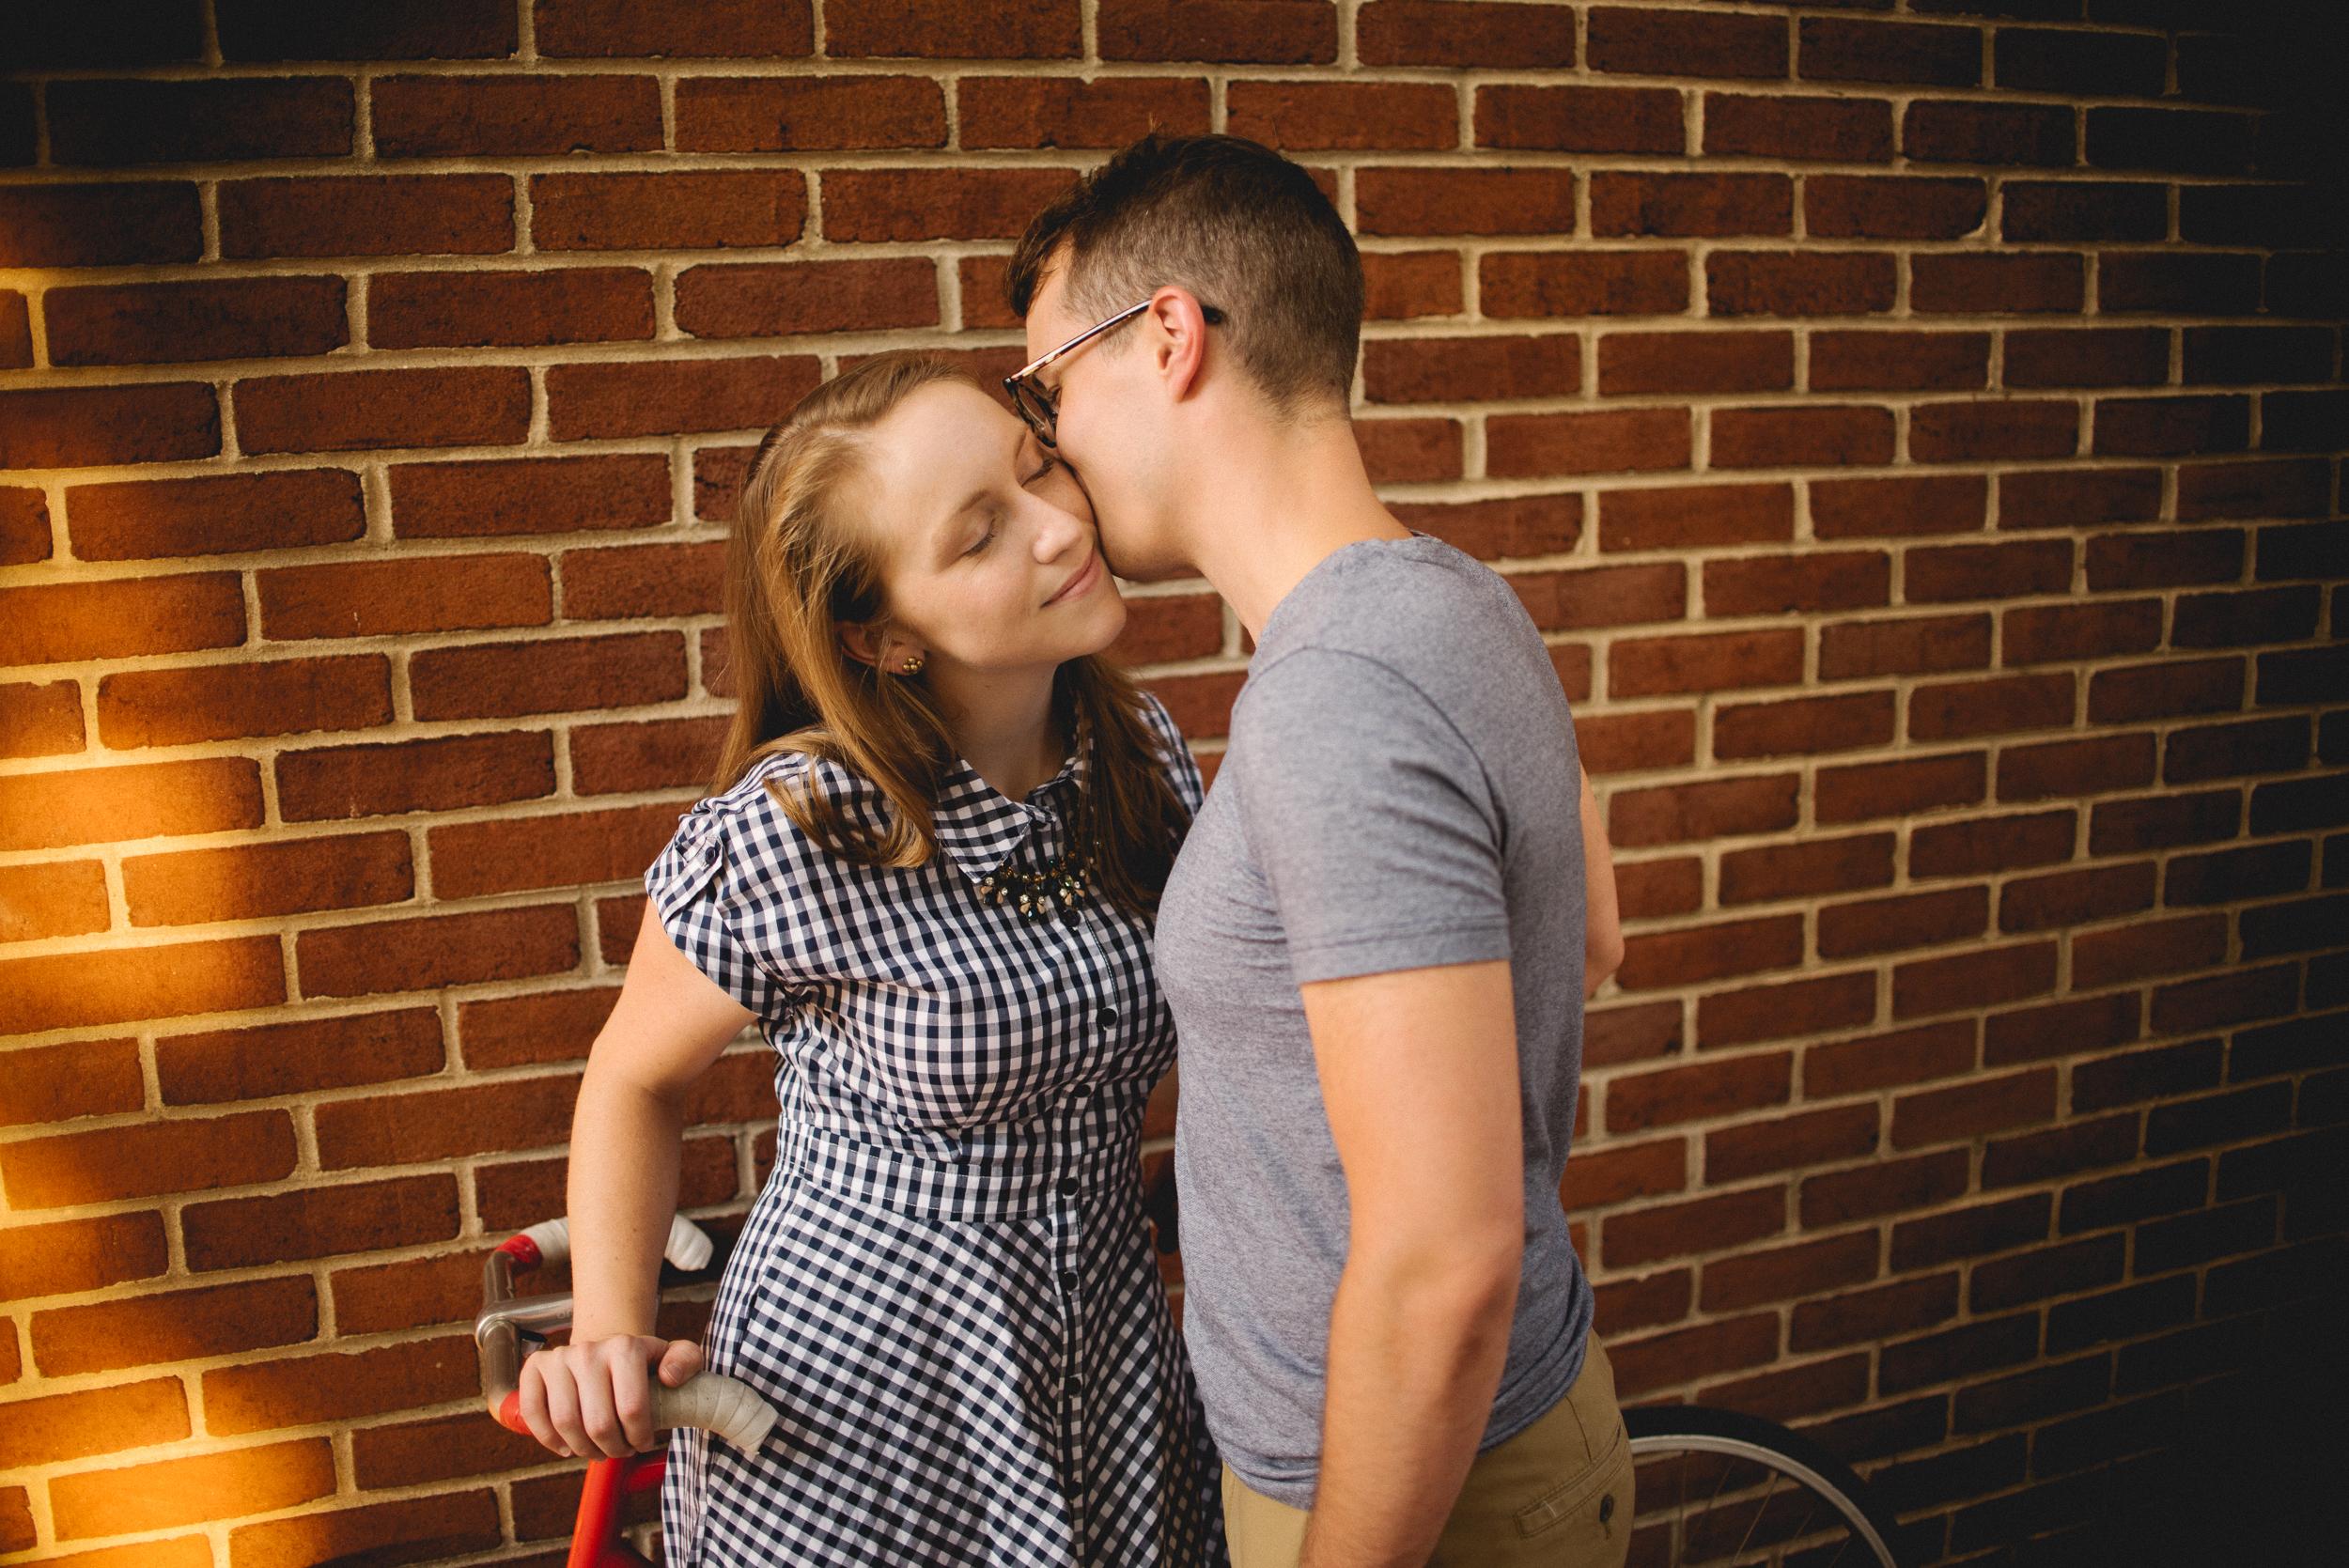 Peaberry-Photography-Society-Hill-Philadelphia-Pennsylvania-Newlyweds-Just-Married-039.jpg